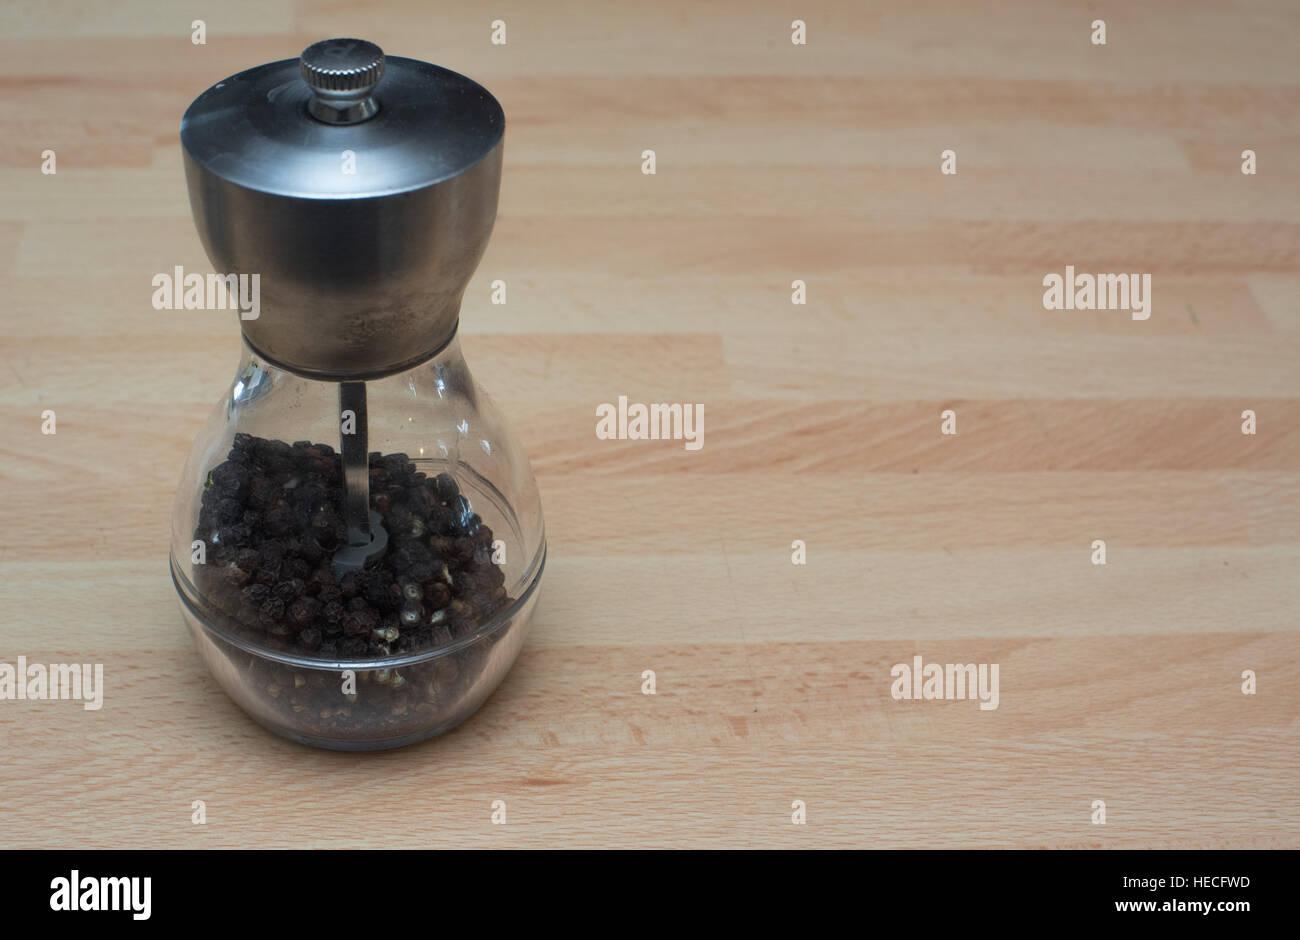 Pepperbox - Stock Image